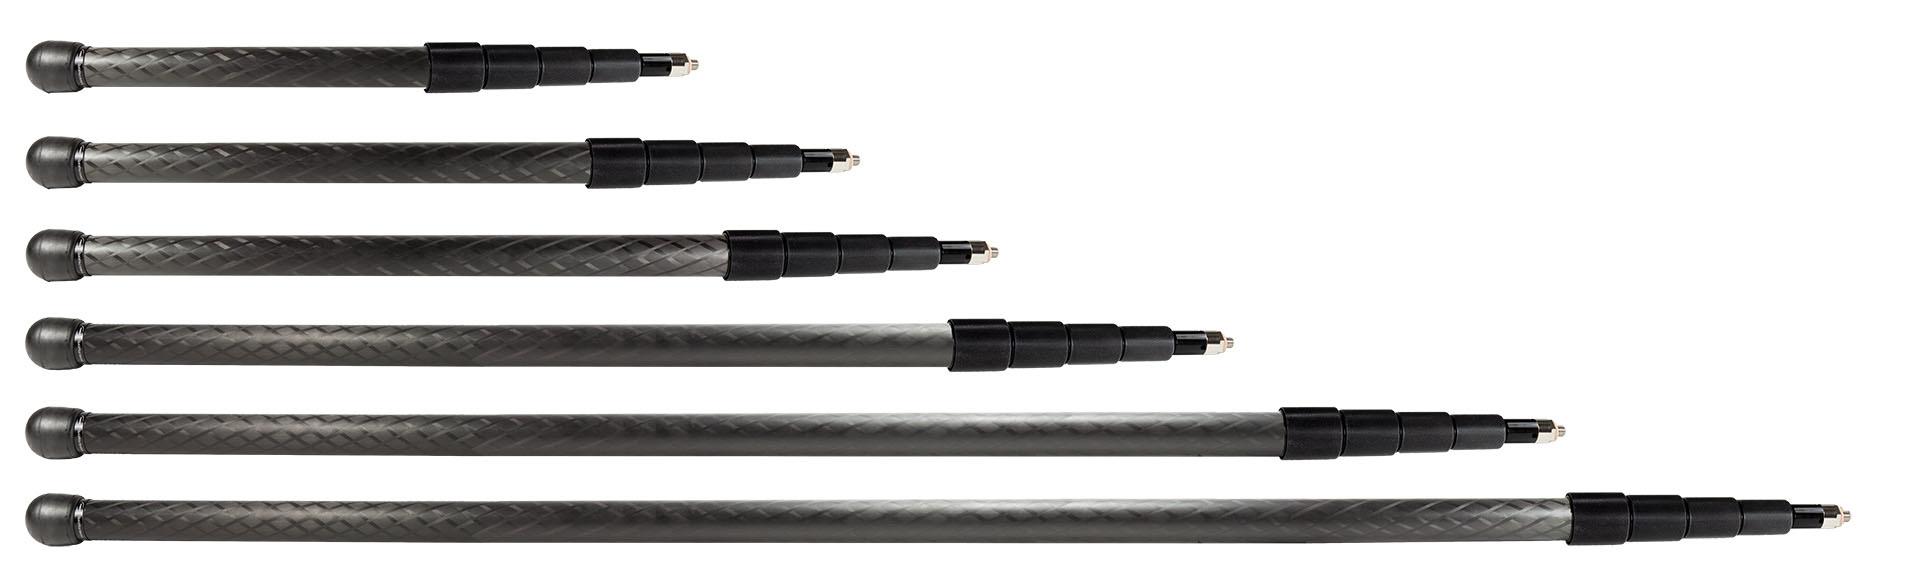 Ambient Ambient - QP5150  Series 5 - 152 - 631 cm